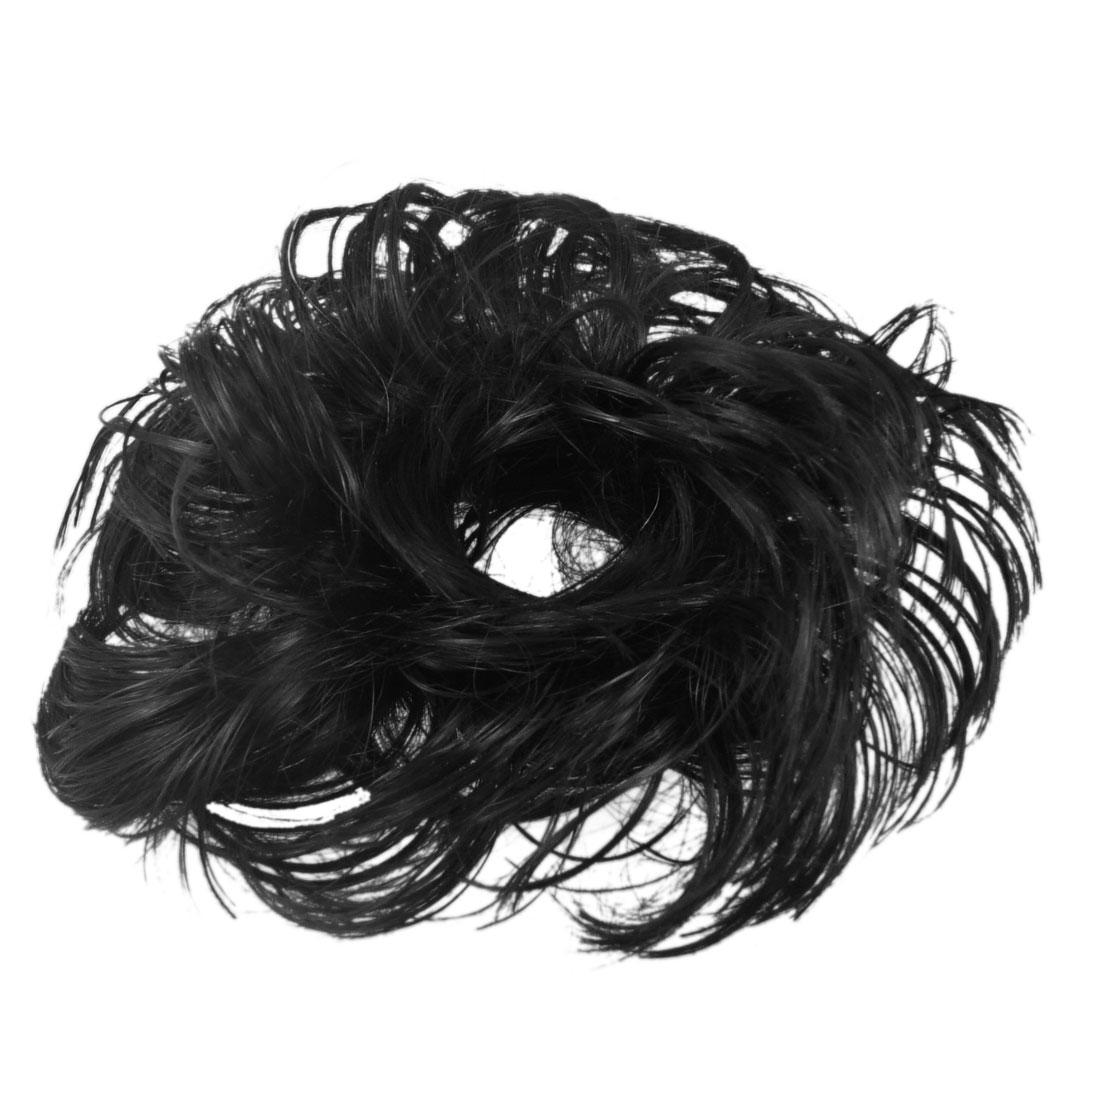 "5.5"" Dia Black DIY Party Faux Hair Wig Wave Hairpiece Bun for Girl Woman"